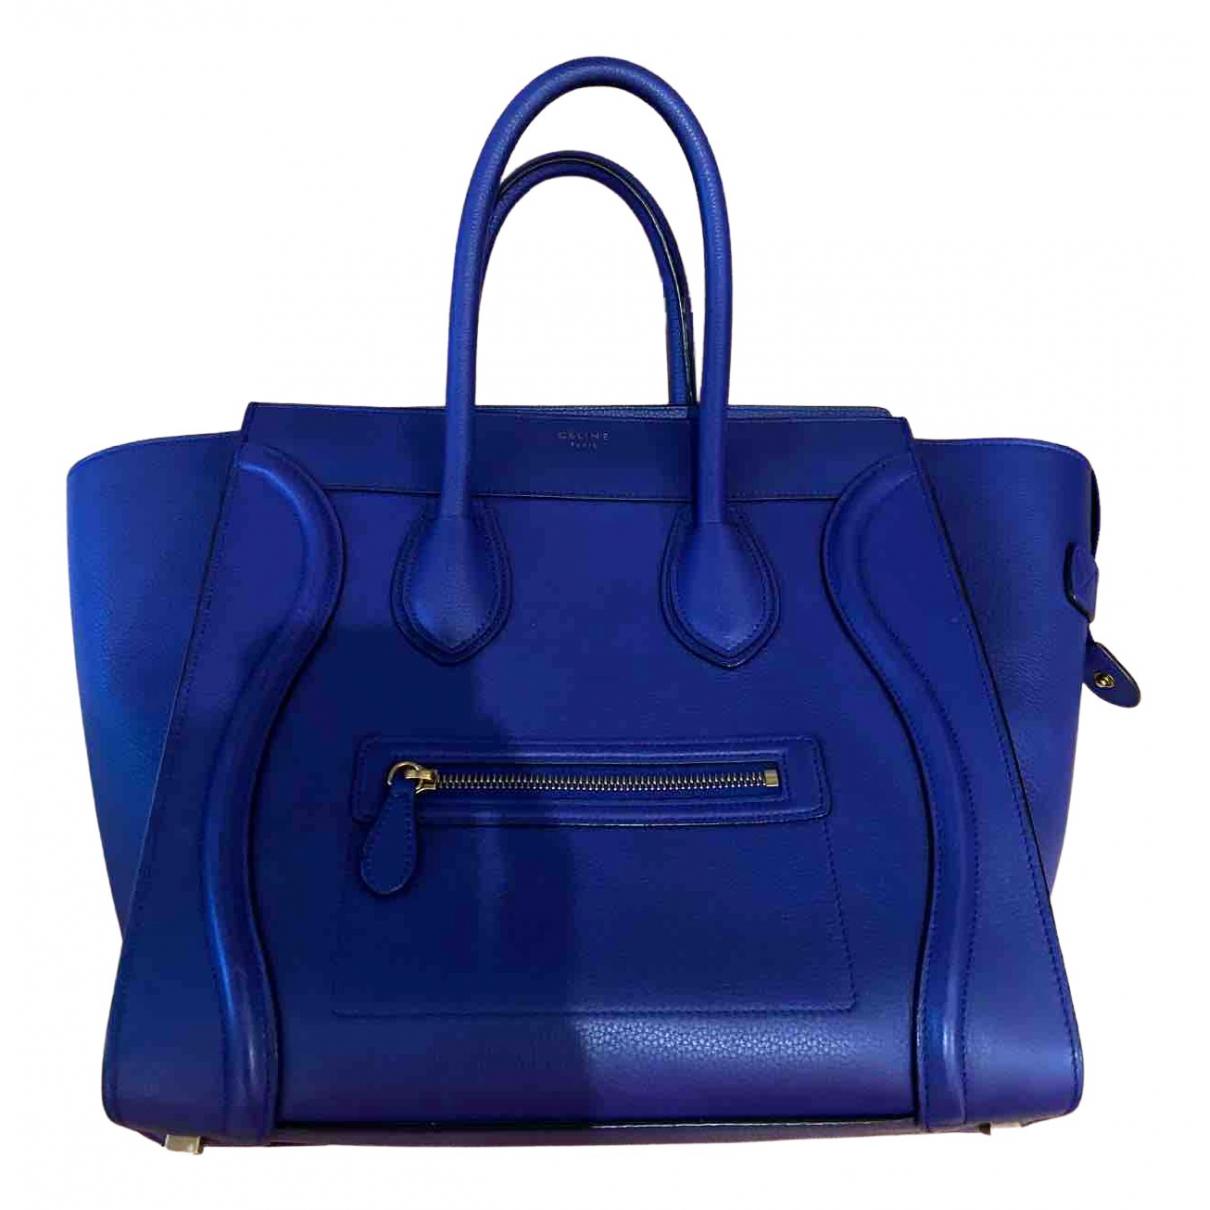 Celine Luggage Blue Leather handbag for Women N